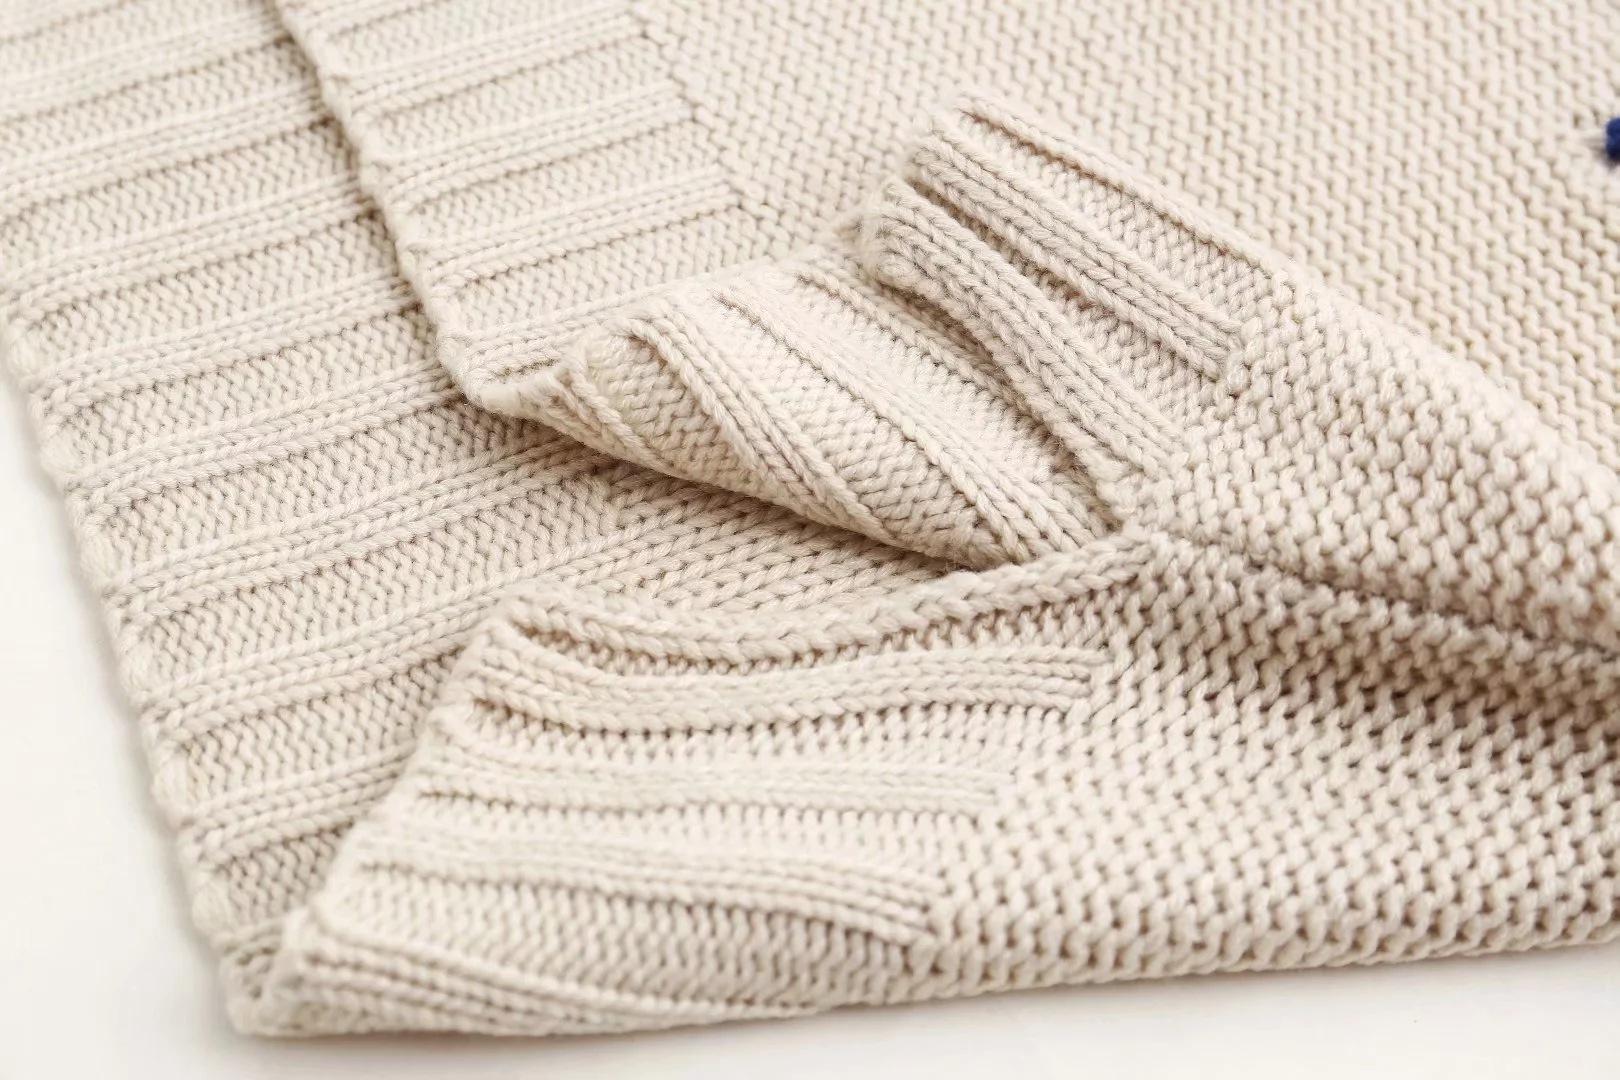 Autumn and Winter 19 Korean Women's Sweater Tassel Pullover Knit Sweater Women Sweaters and Pullovers Winter Clothes Women 10